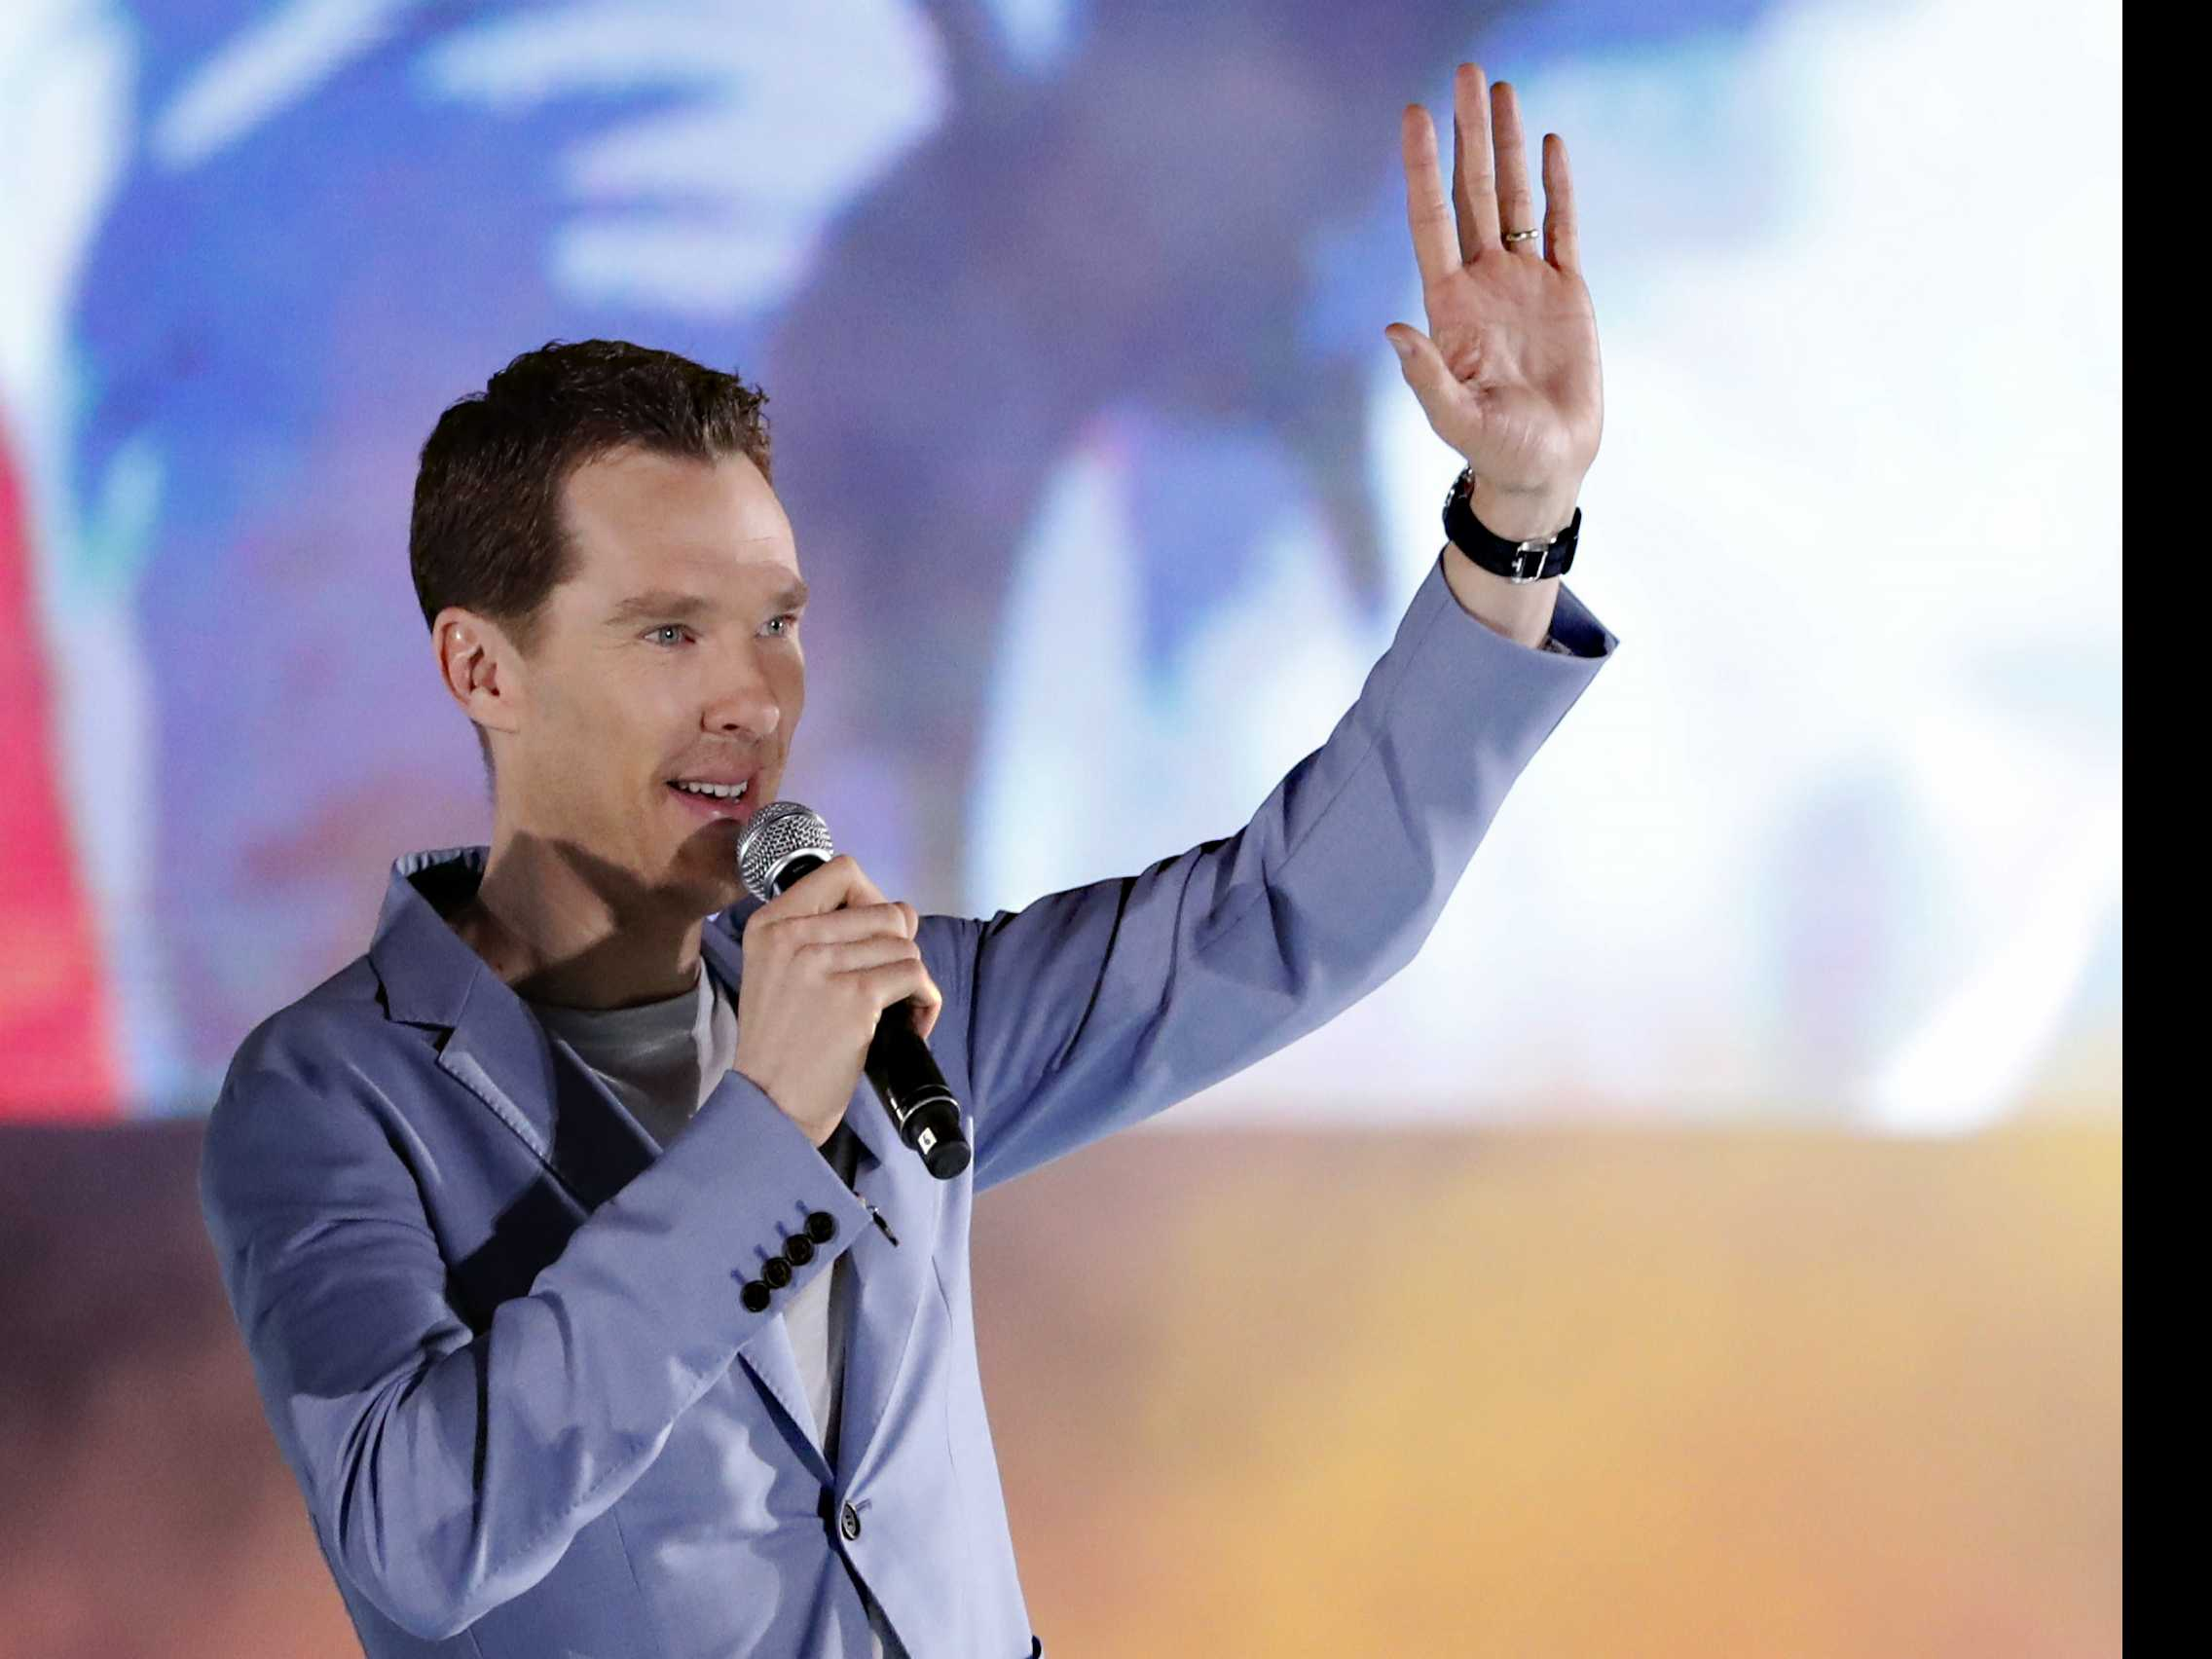 'Sherlock' Star Cumberbatch Praised for Tackling Mugger